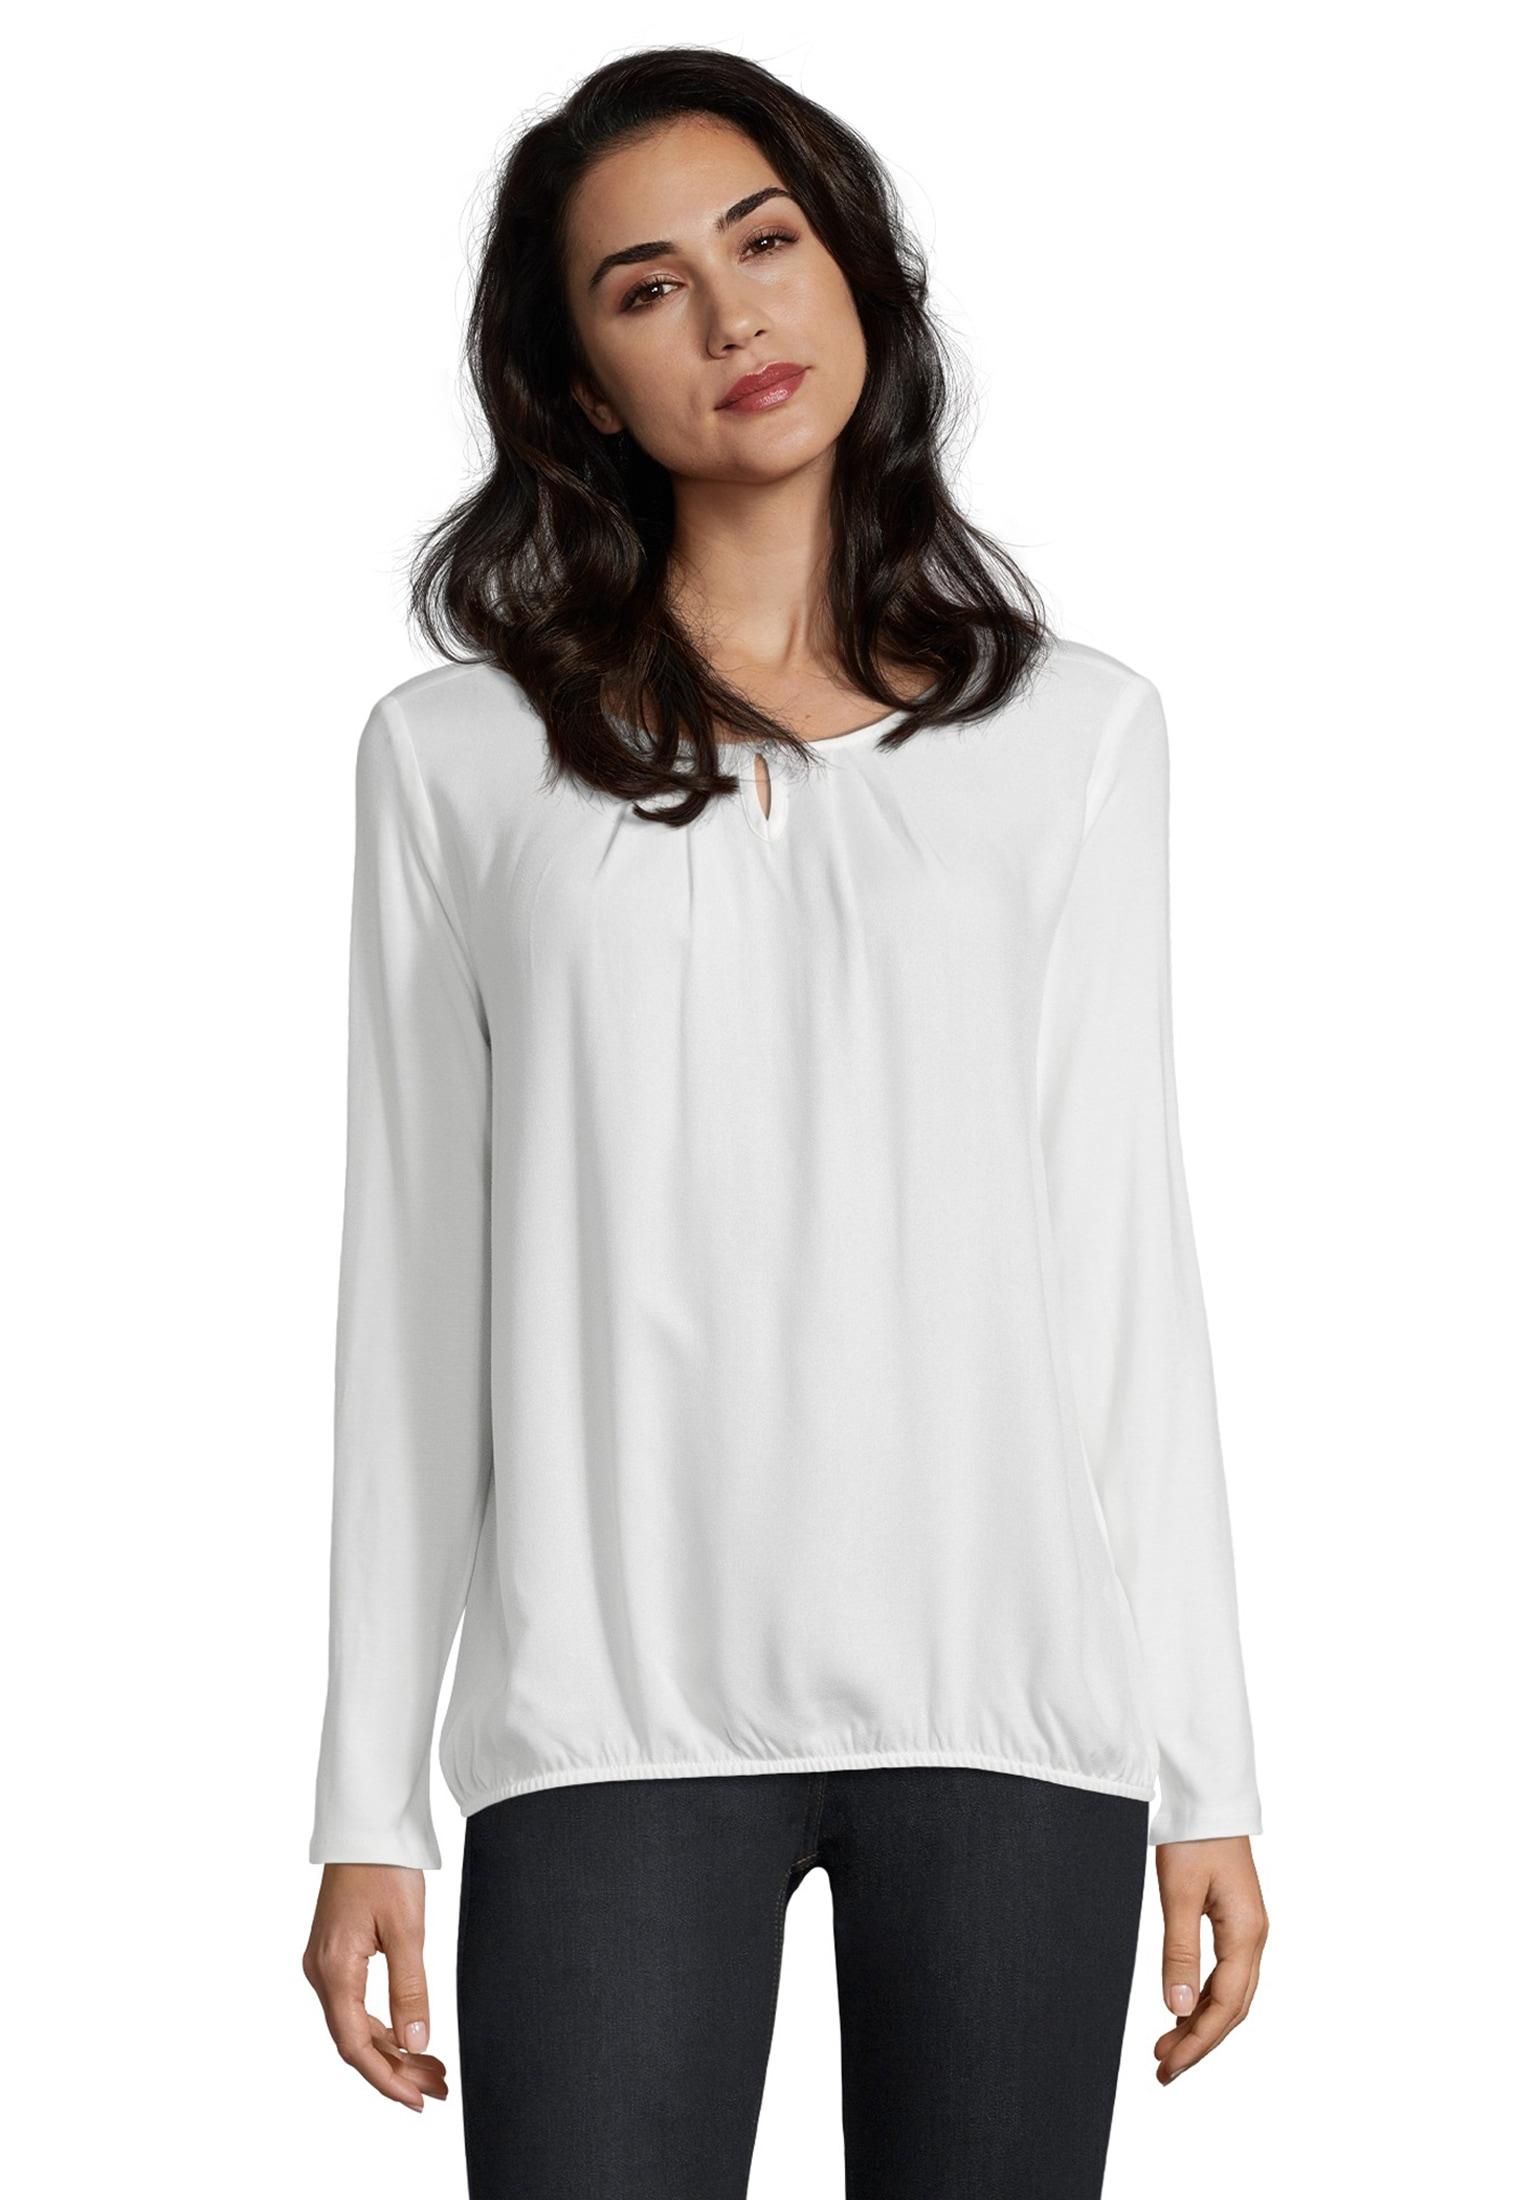 Betty Barclay Blusenshirt mit Gummizug Damenmode/Bekleidung/Shirts & Sweatshirts/Blusenshirts